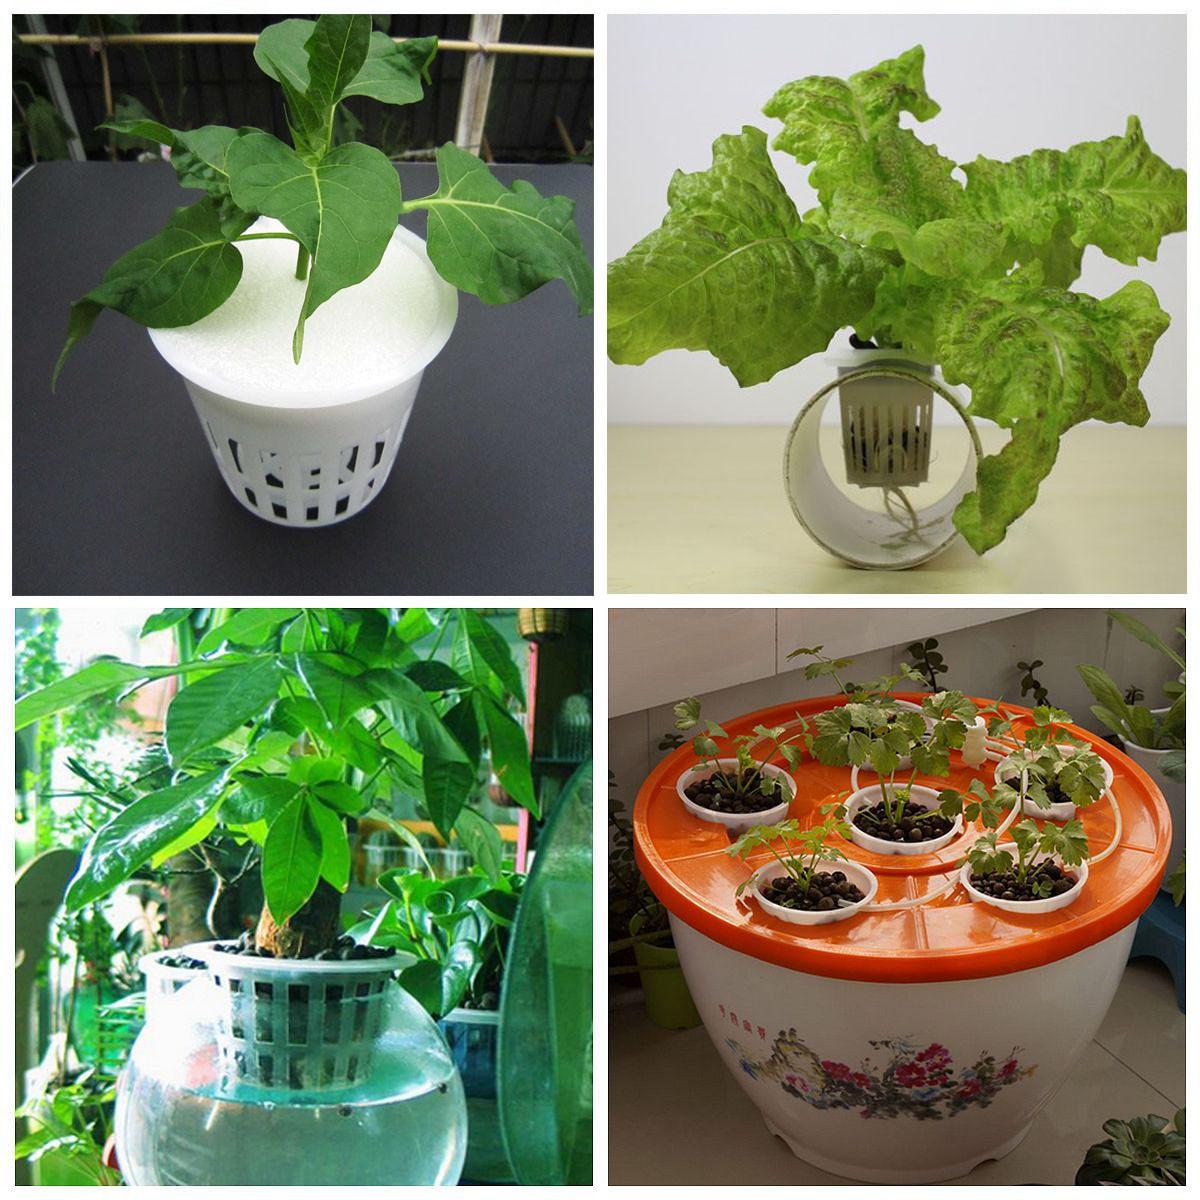 11.2cm White Hydroponic Mesh Plastic Pot Net Cup Basket Aeroponic Garden Plant Grow Clone Container